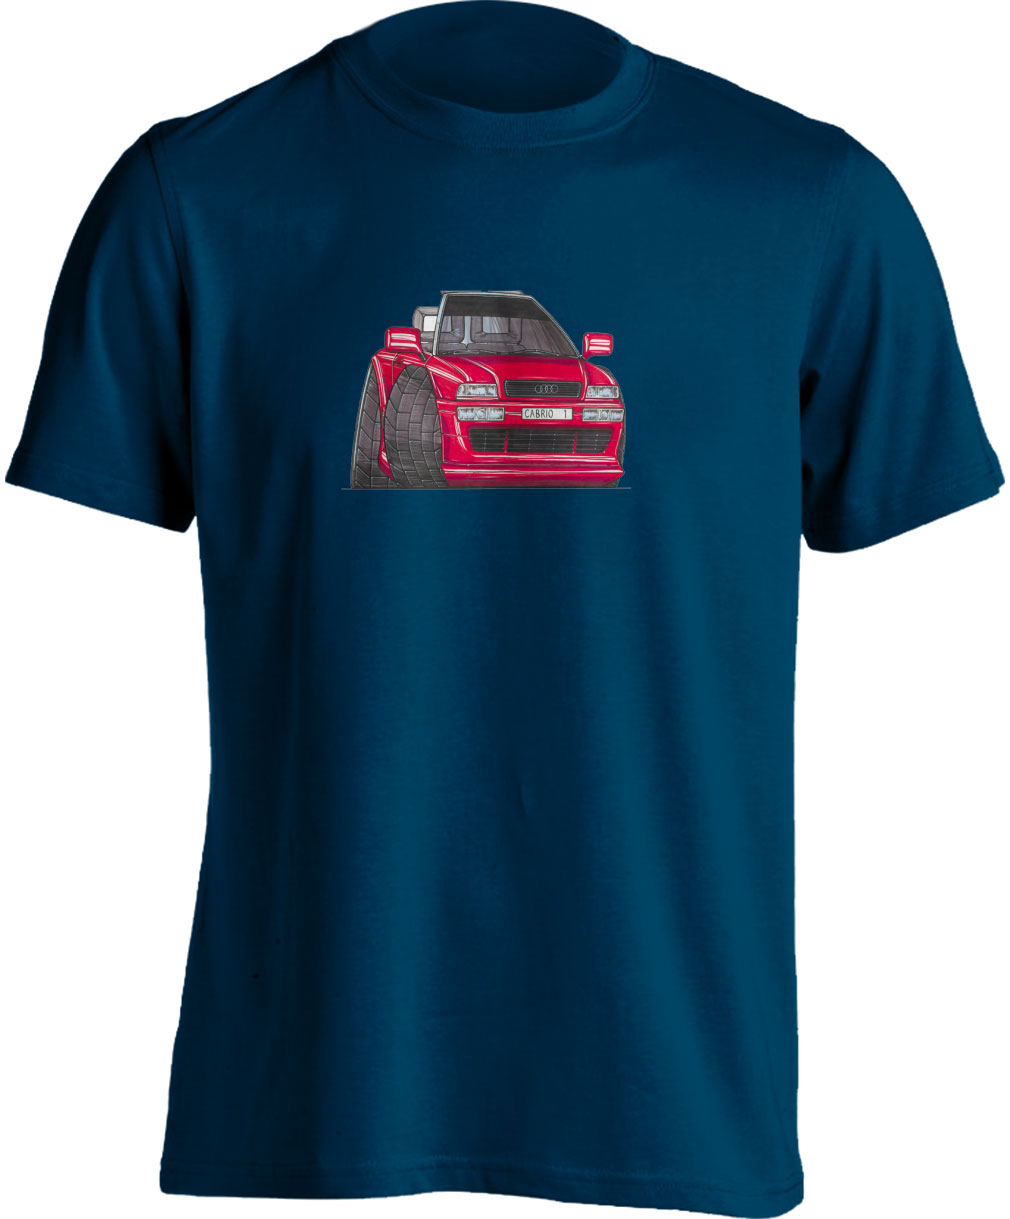 Koolart Audi 80 Cabrio Red0377 Child's T Shirt